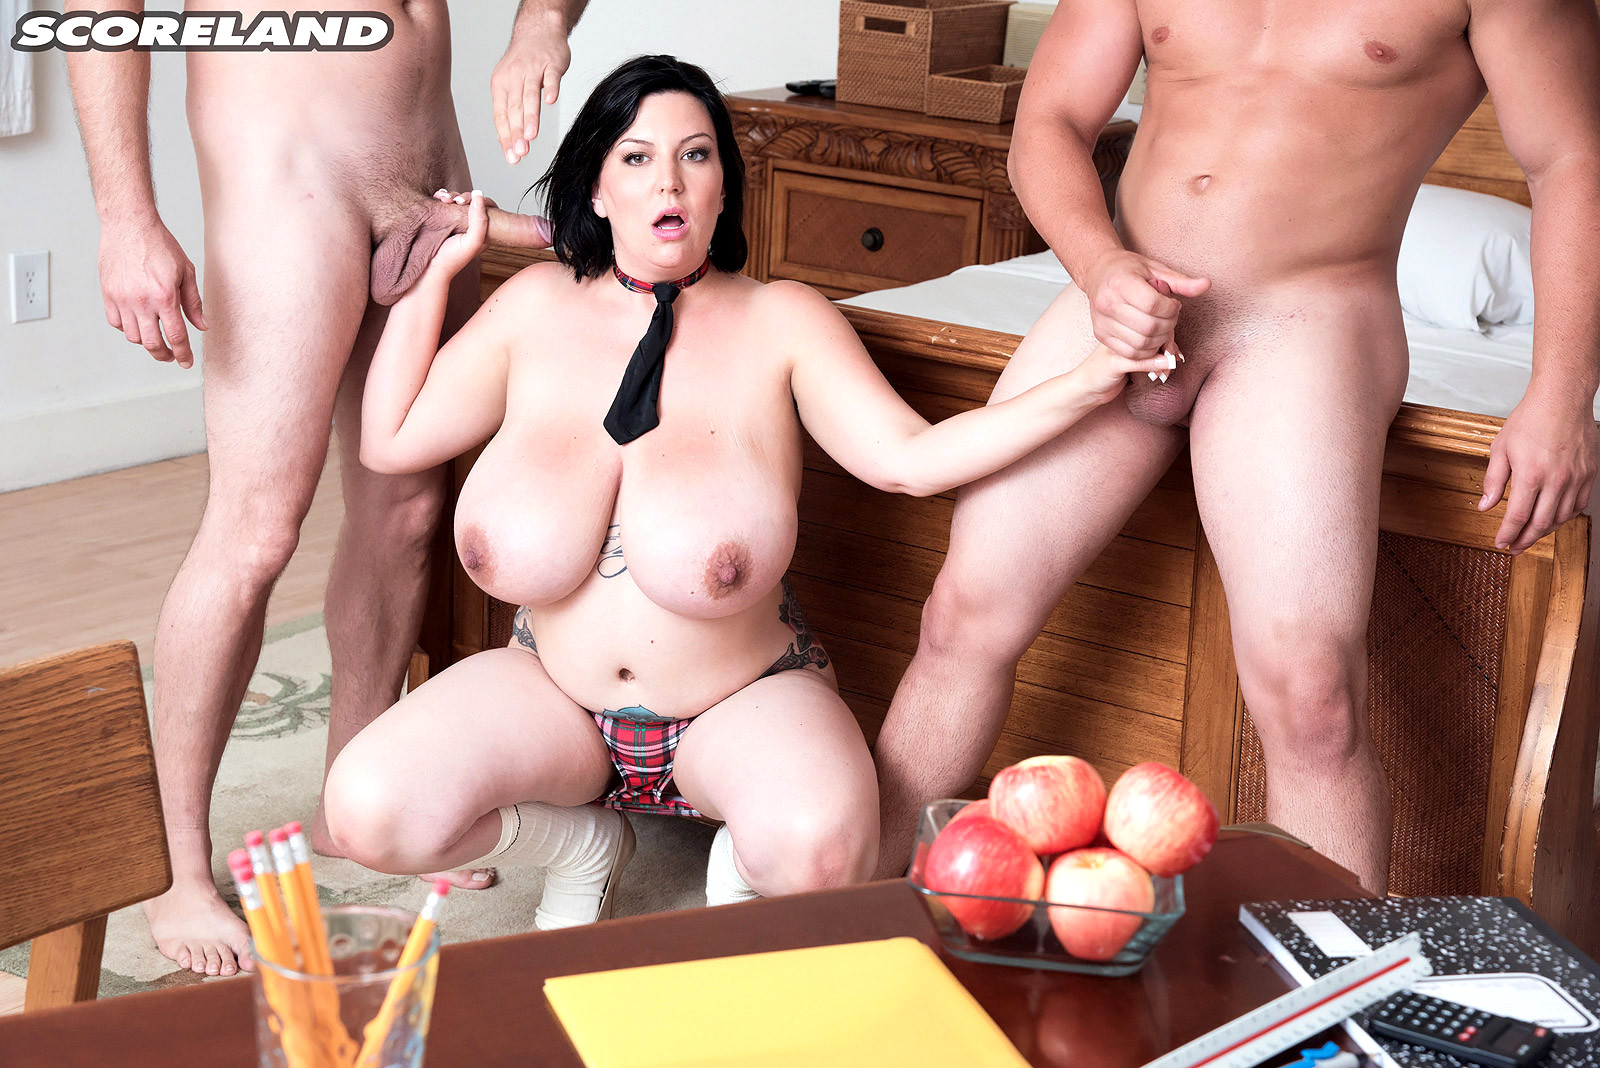 Tight Teen Boobs Paige Turner Do Divine Sloppy Blowjob Cum Fixation Free New Porn, Fernandcosta